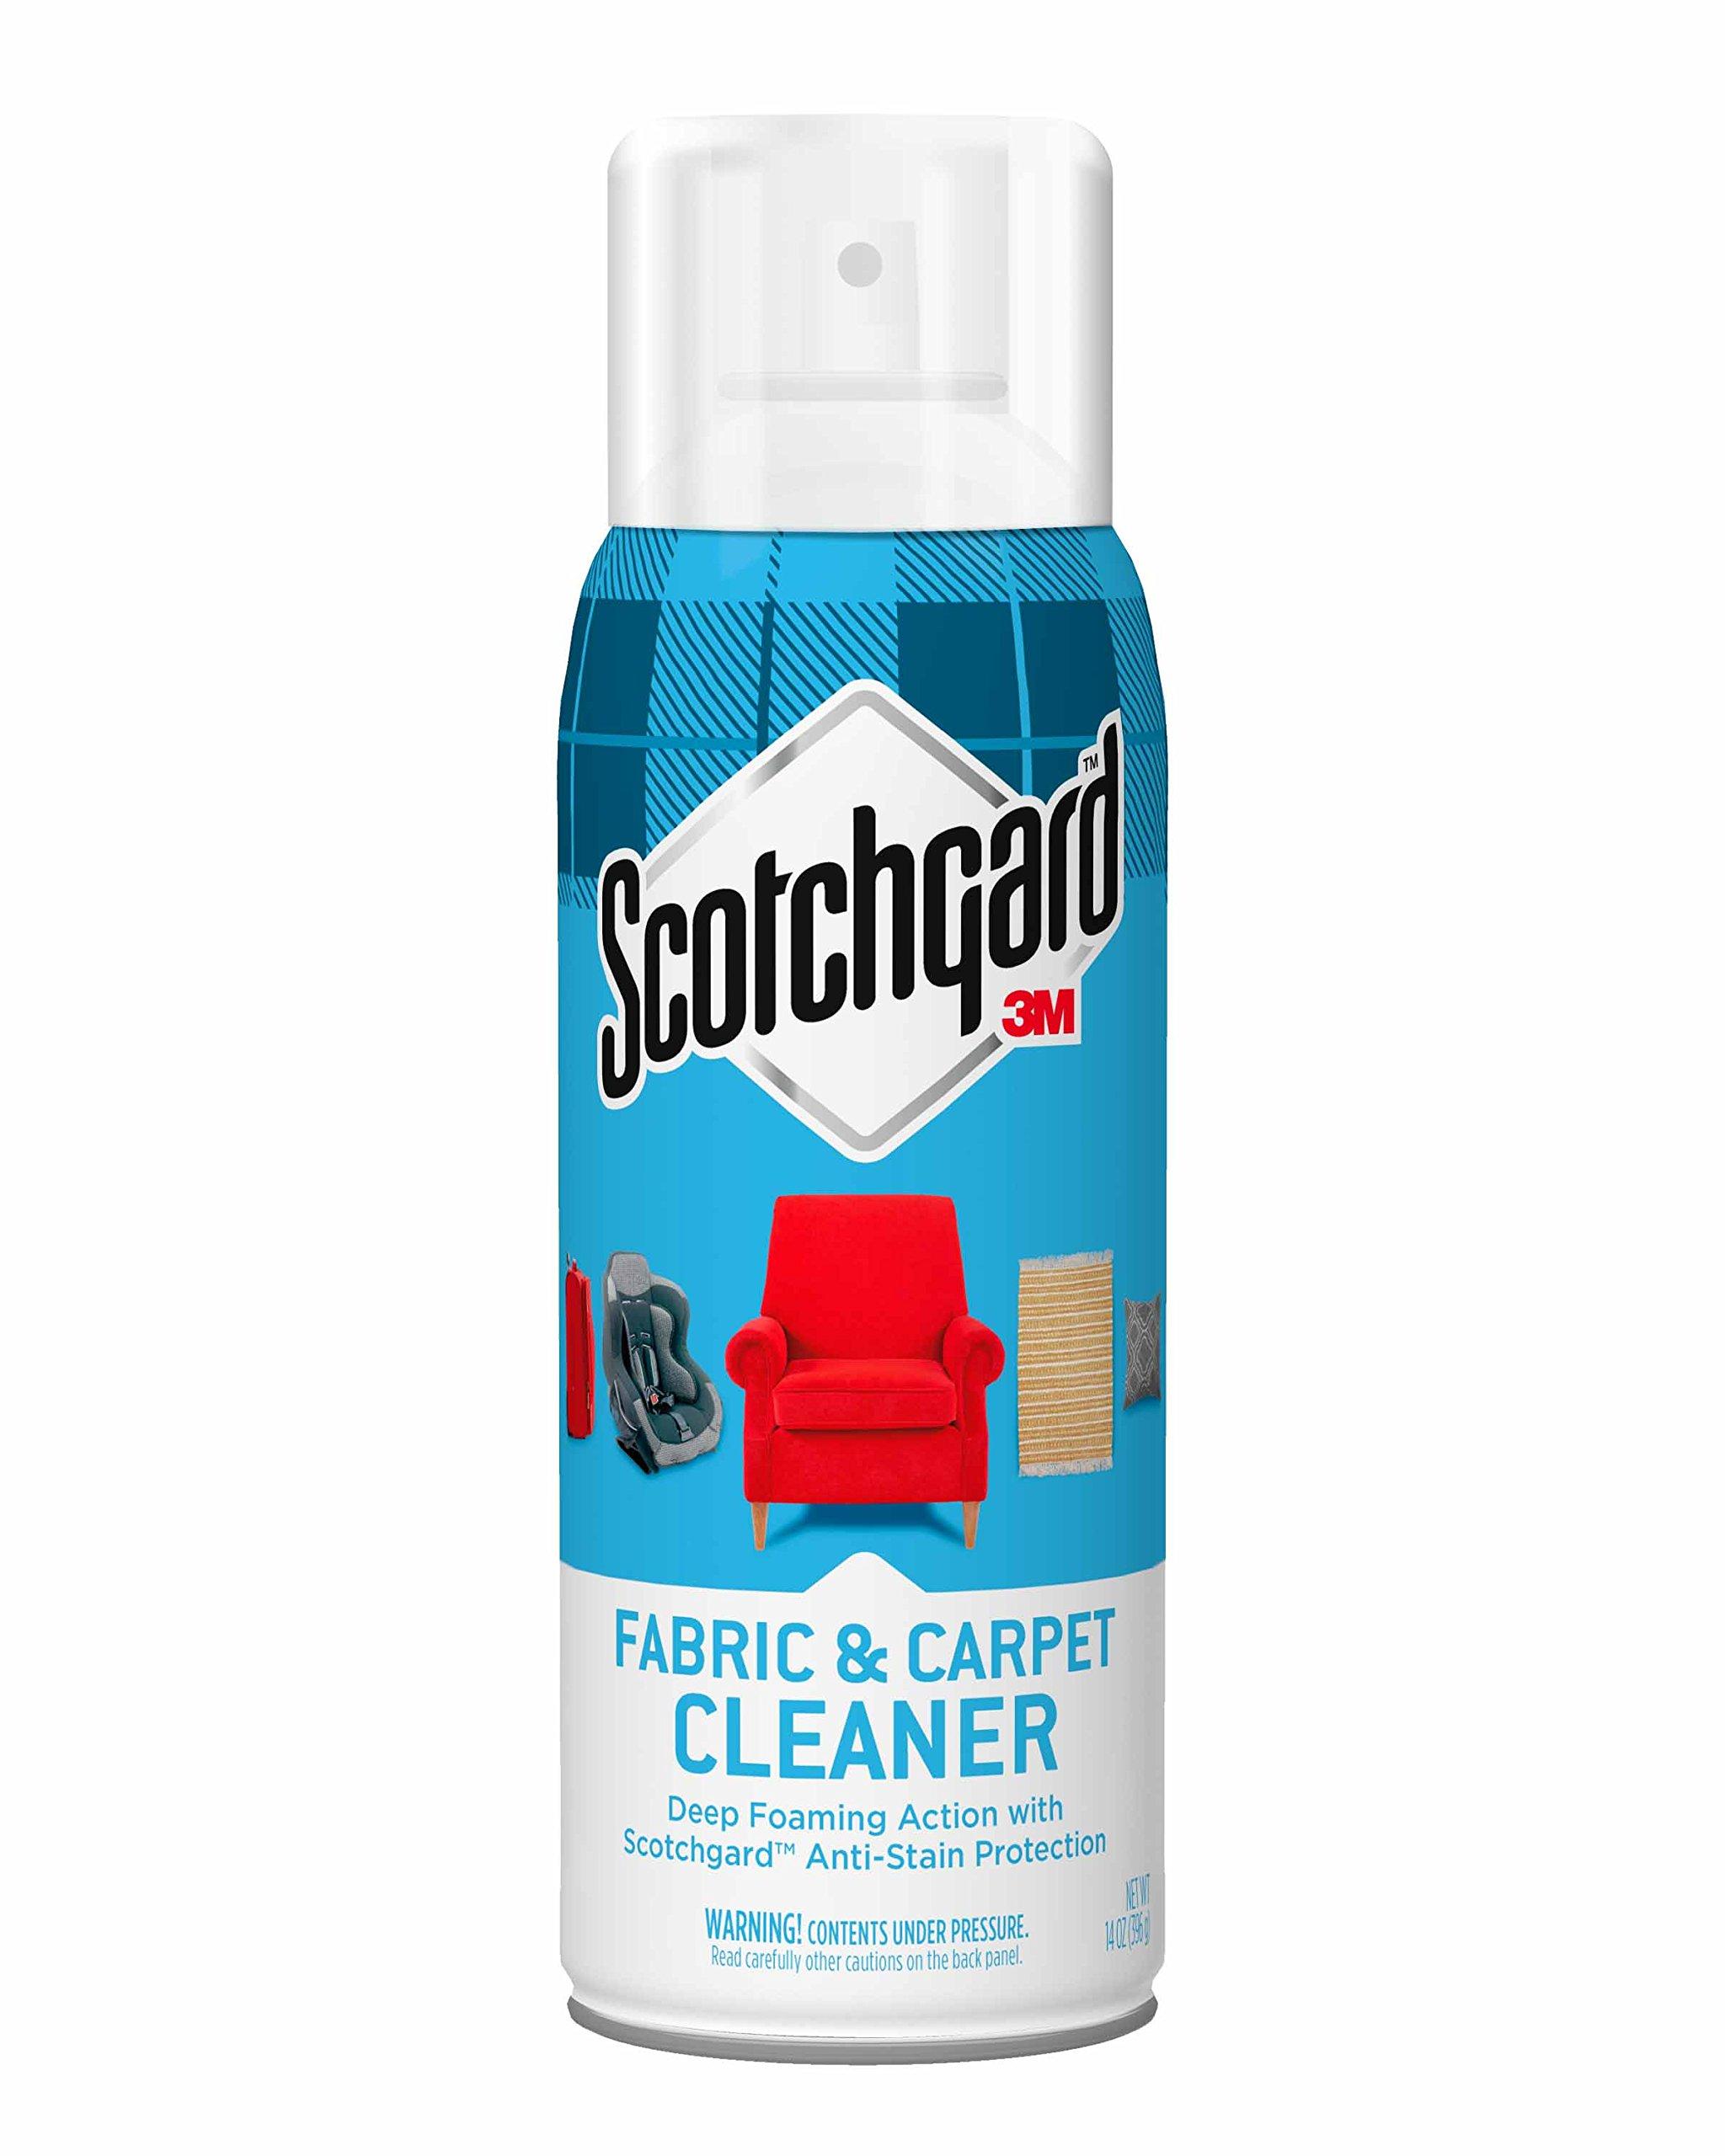 Scotchgard 7100096524 Fabric & Carpet Cleaner, 1 Can, 14-Ounce